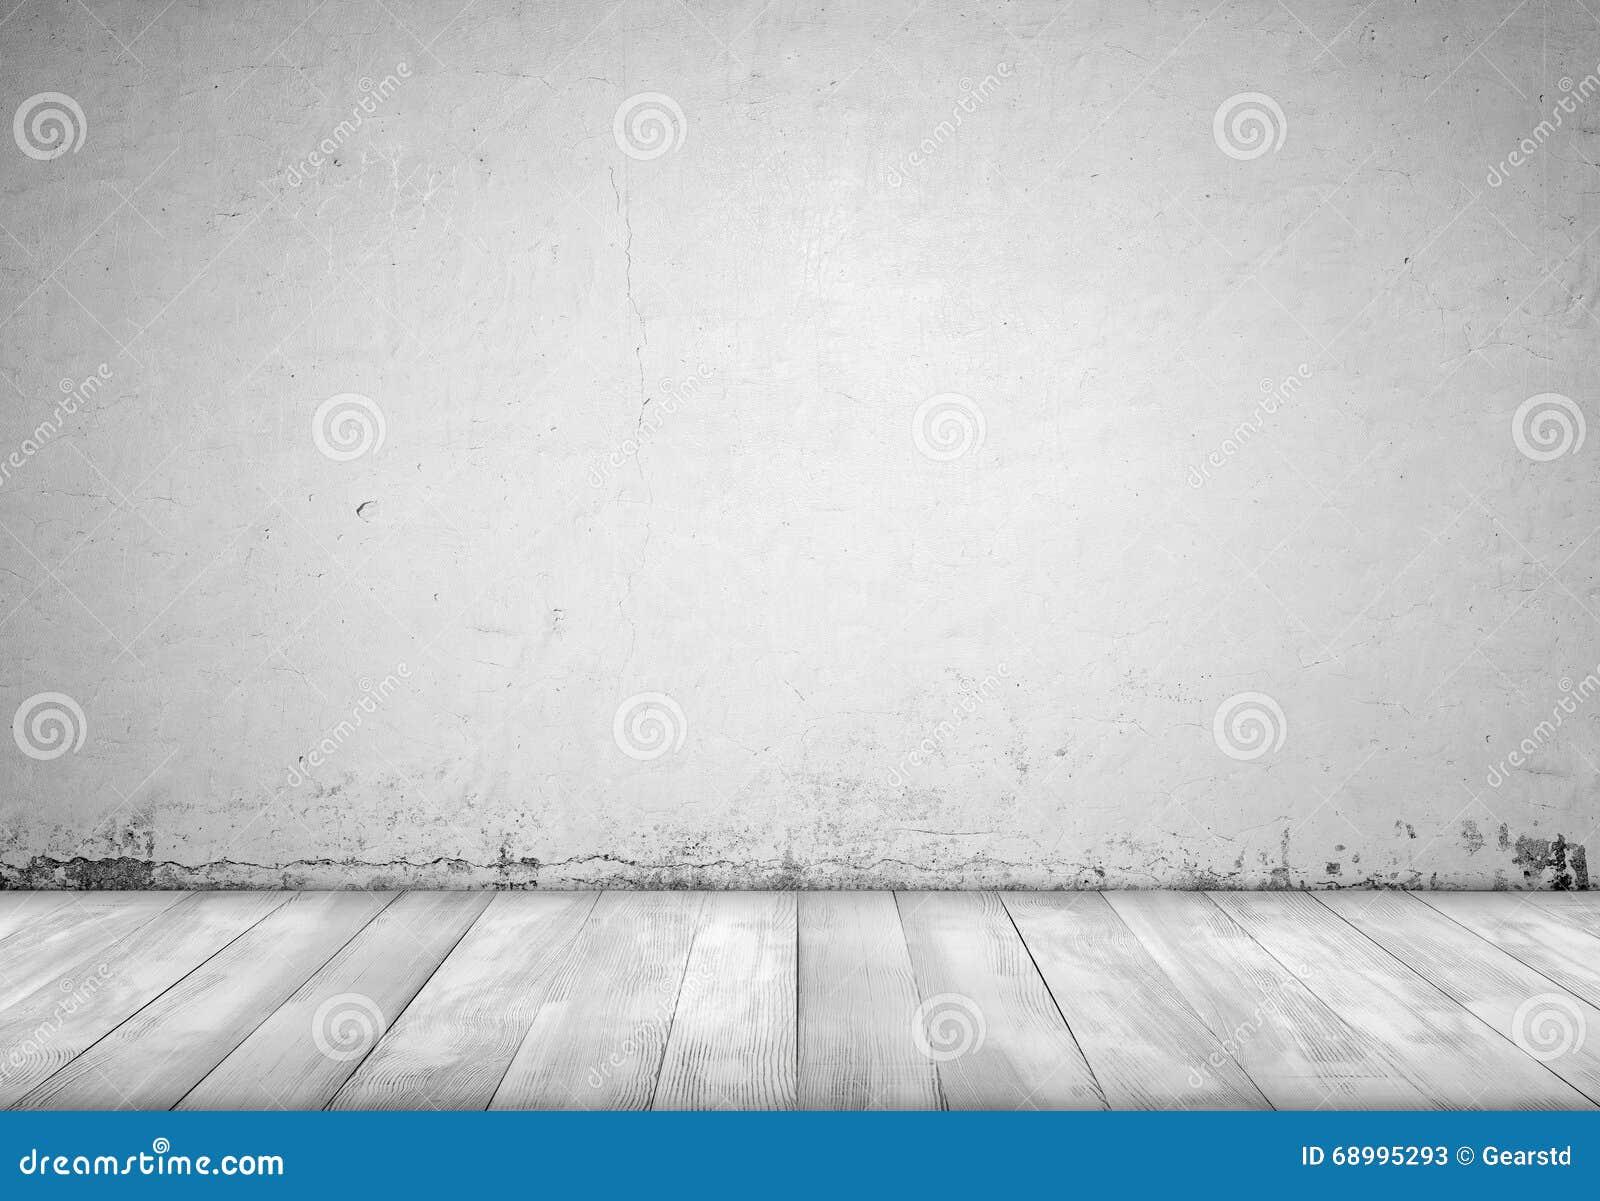 Hintergrundinnenraum Betonmauer Und Holzfussboden Stockbild Bild